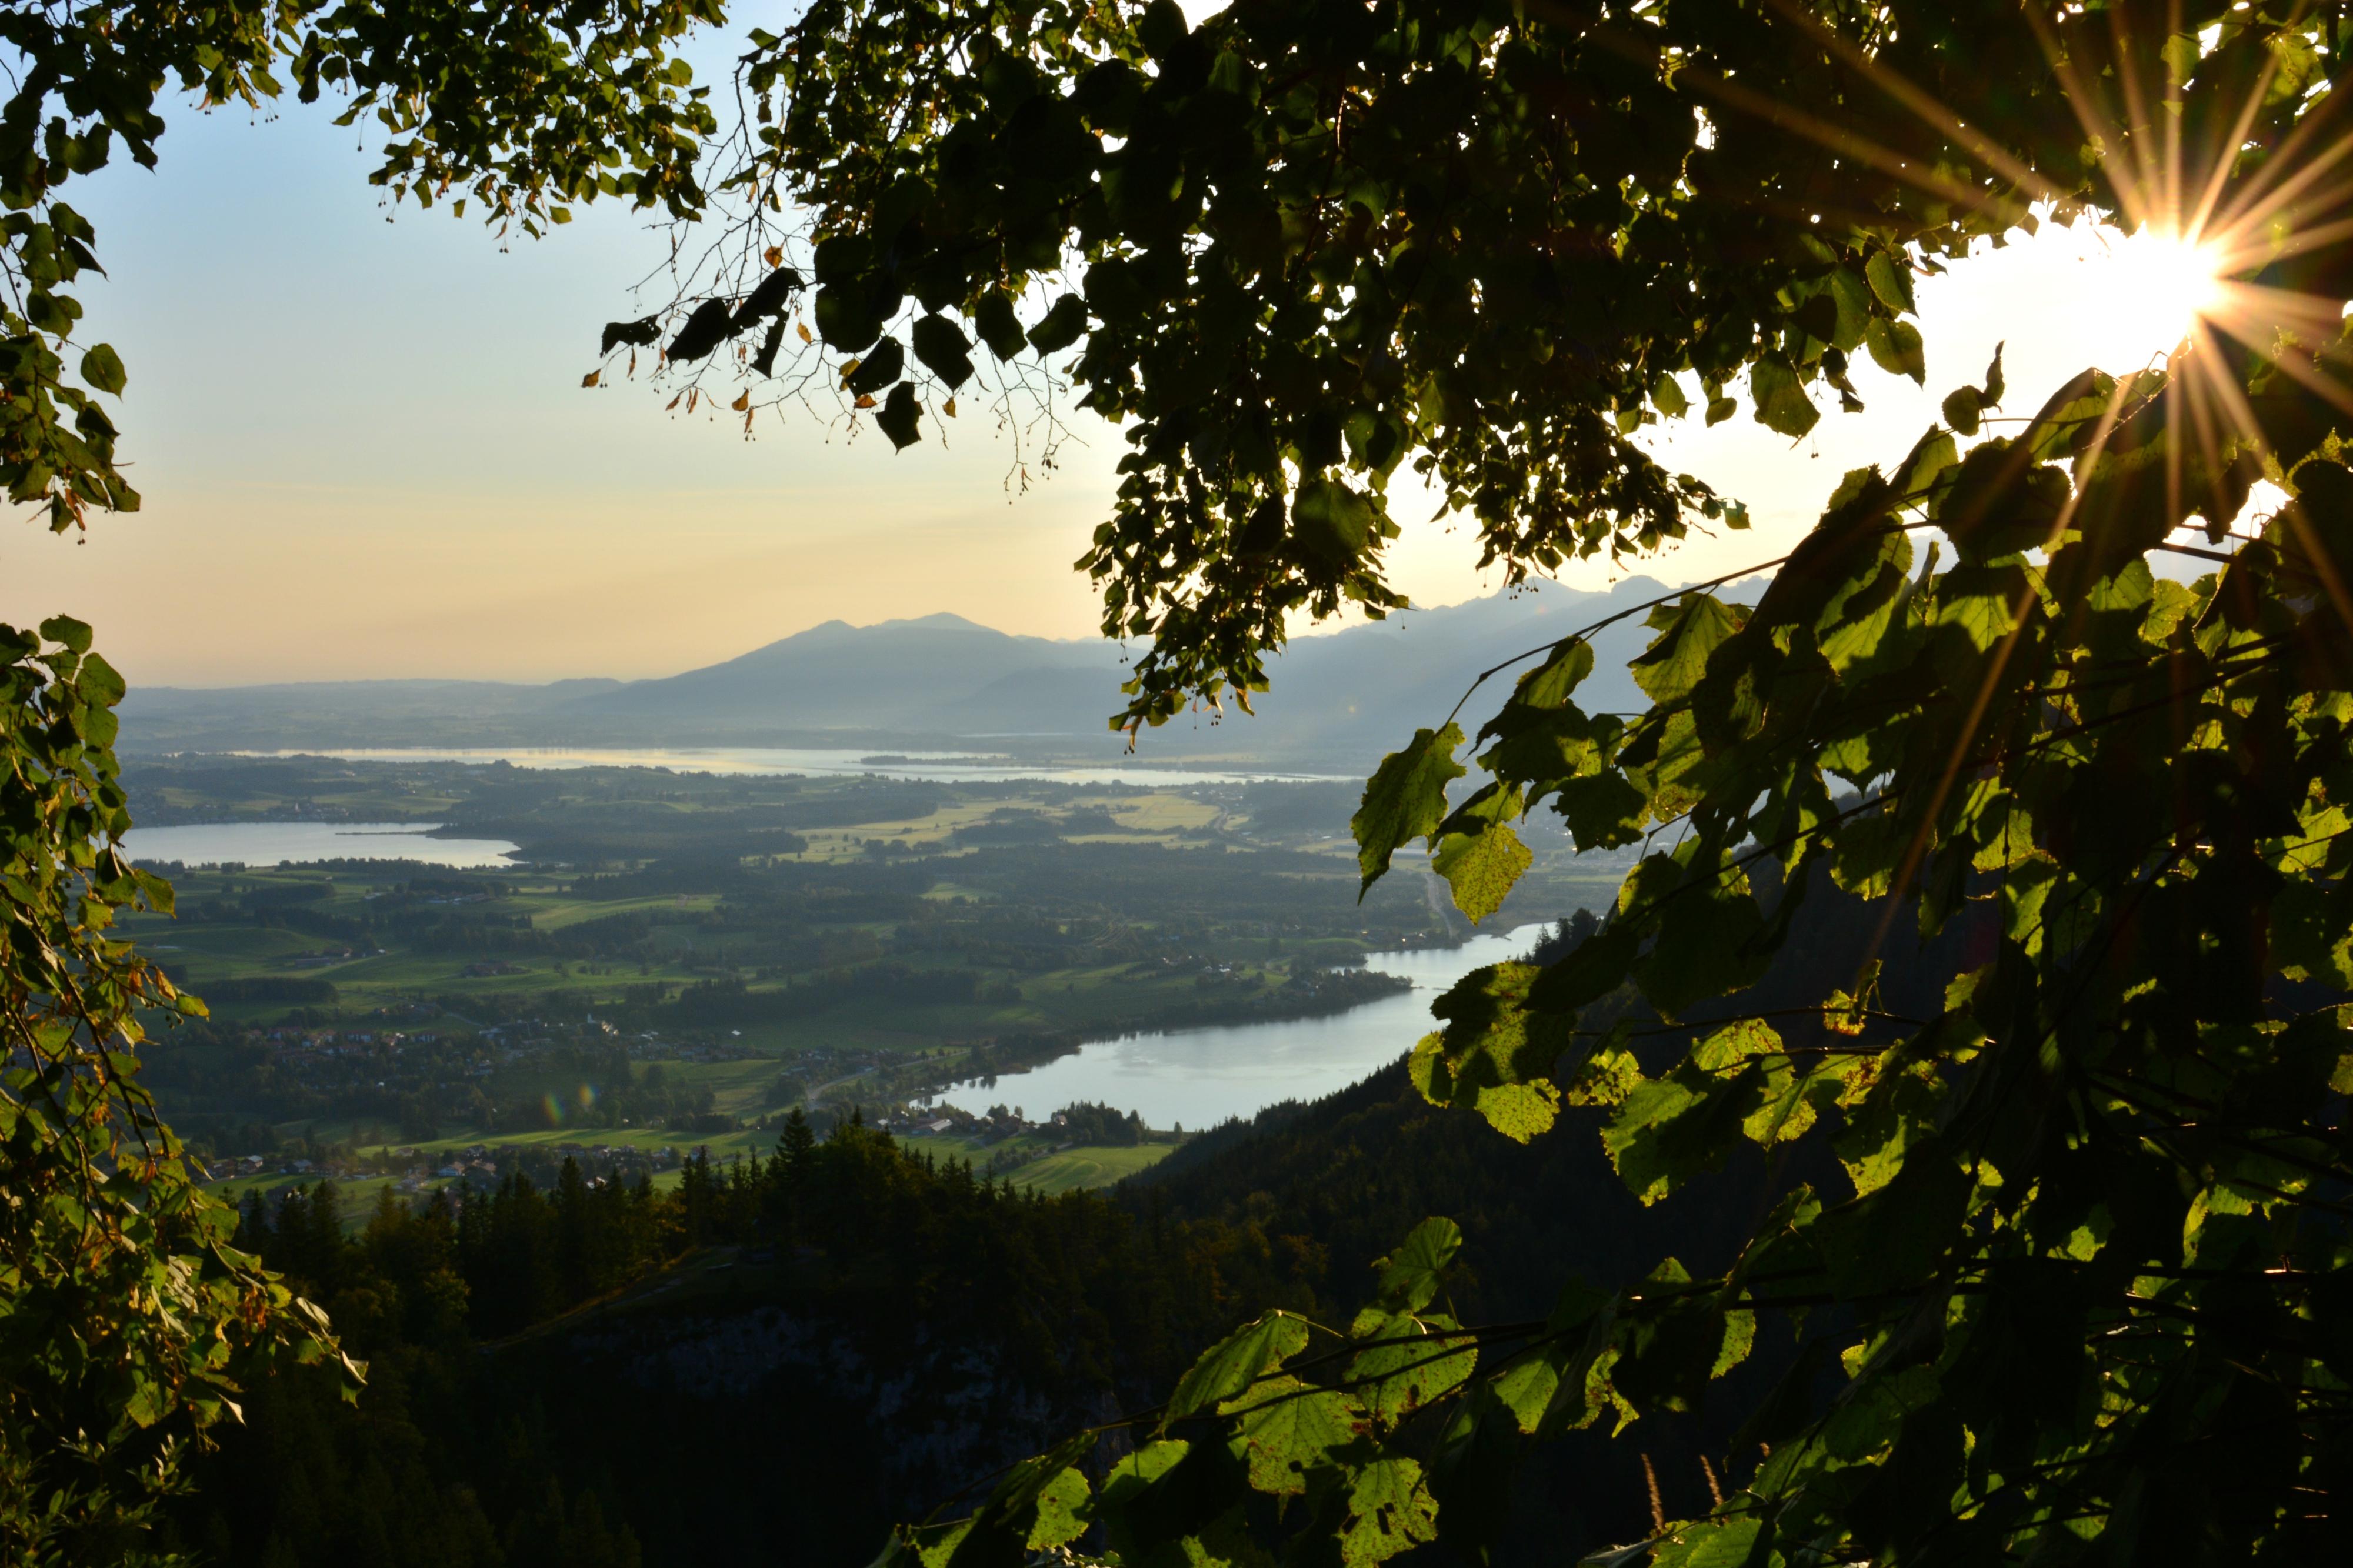 A0166 Sonnenmorgen am Falkenstein.jpg